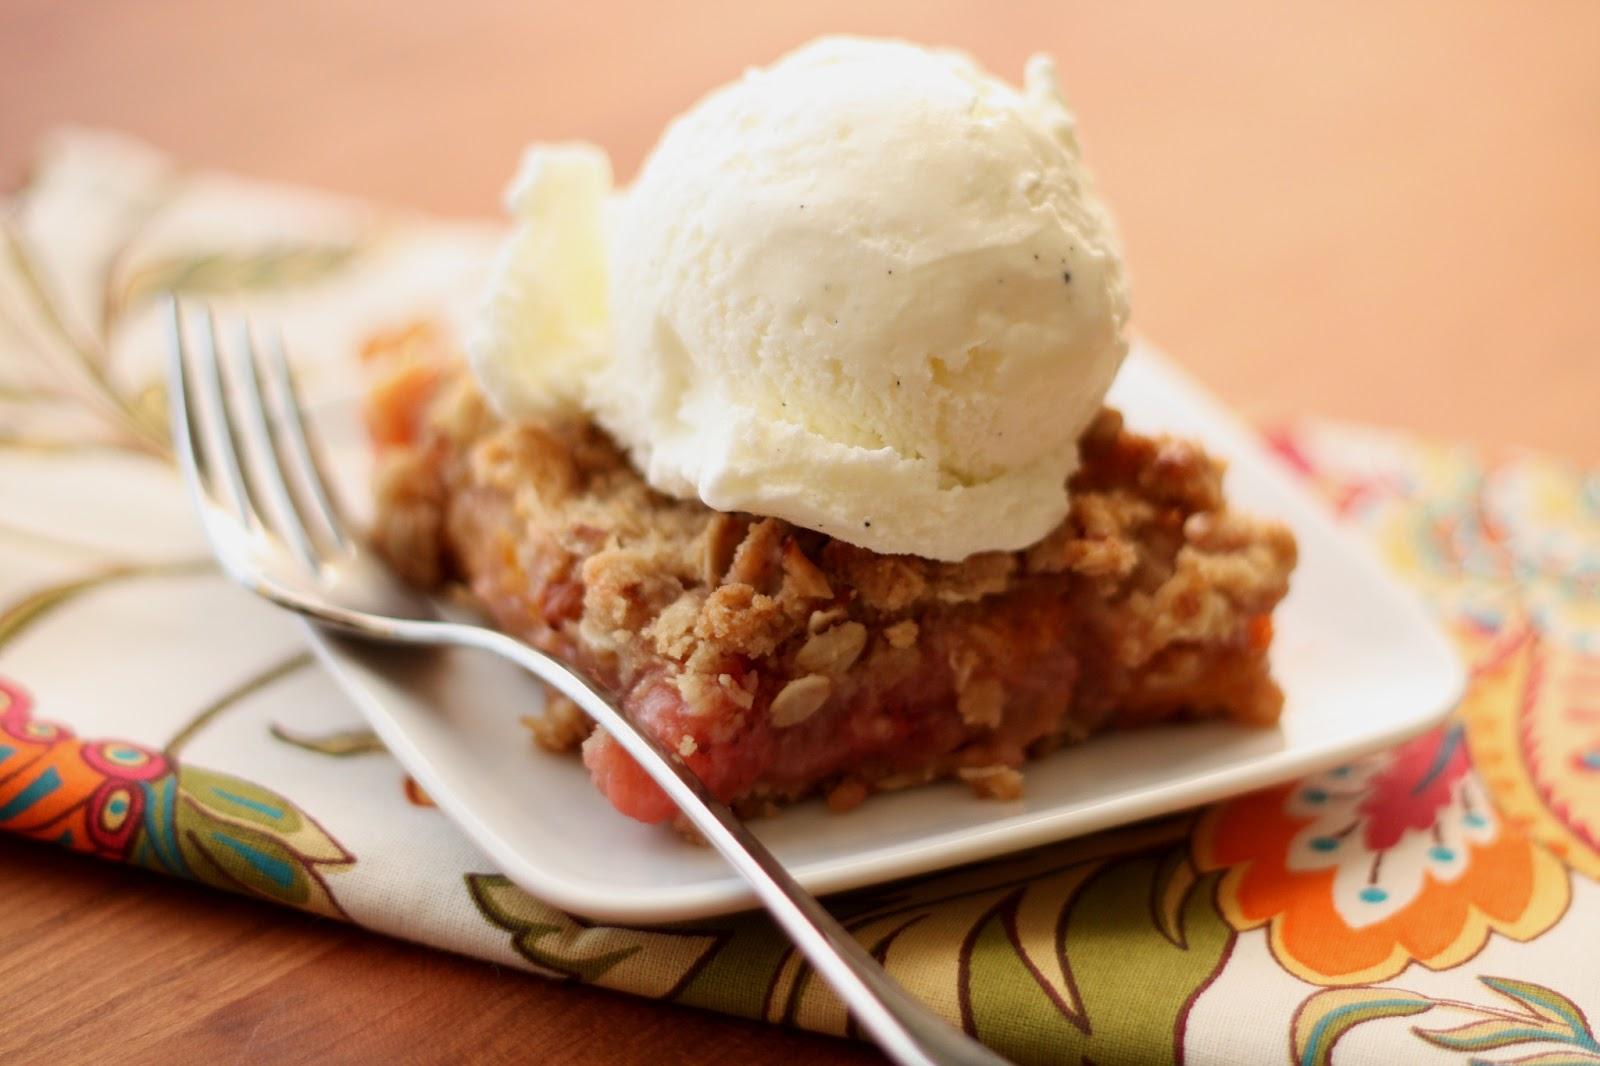 Simple Homemade Vanilla Bean Ice Milk / Ice Cream recipe by Barefeet In The Kitchen